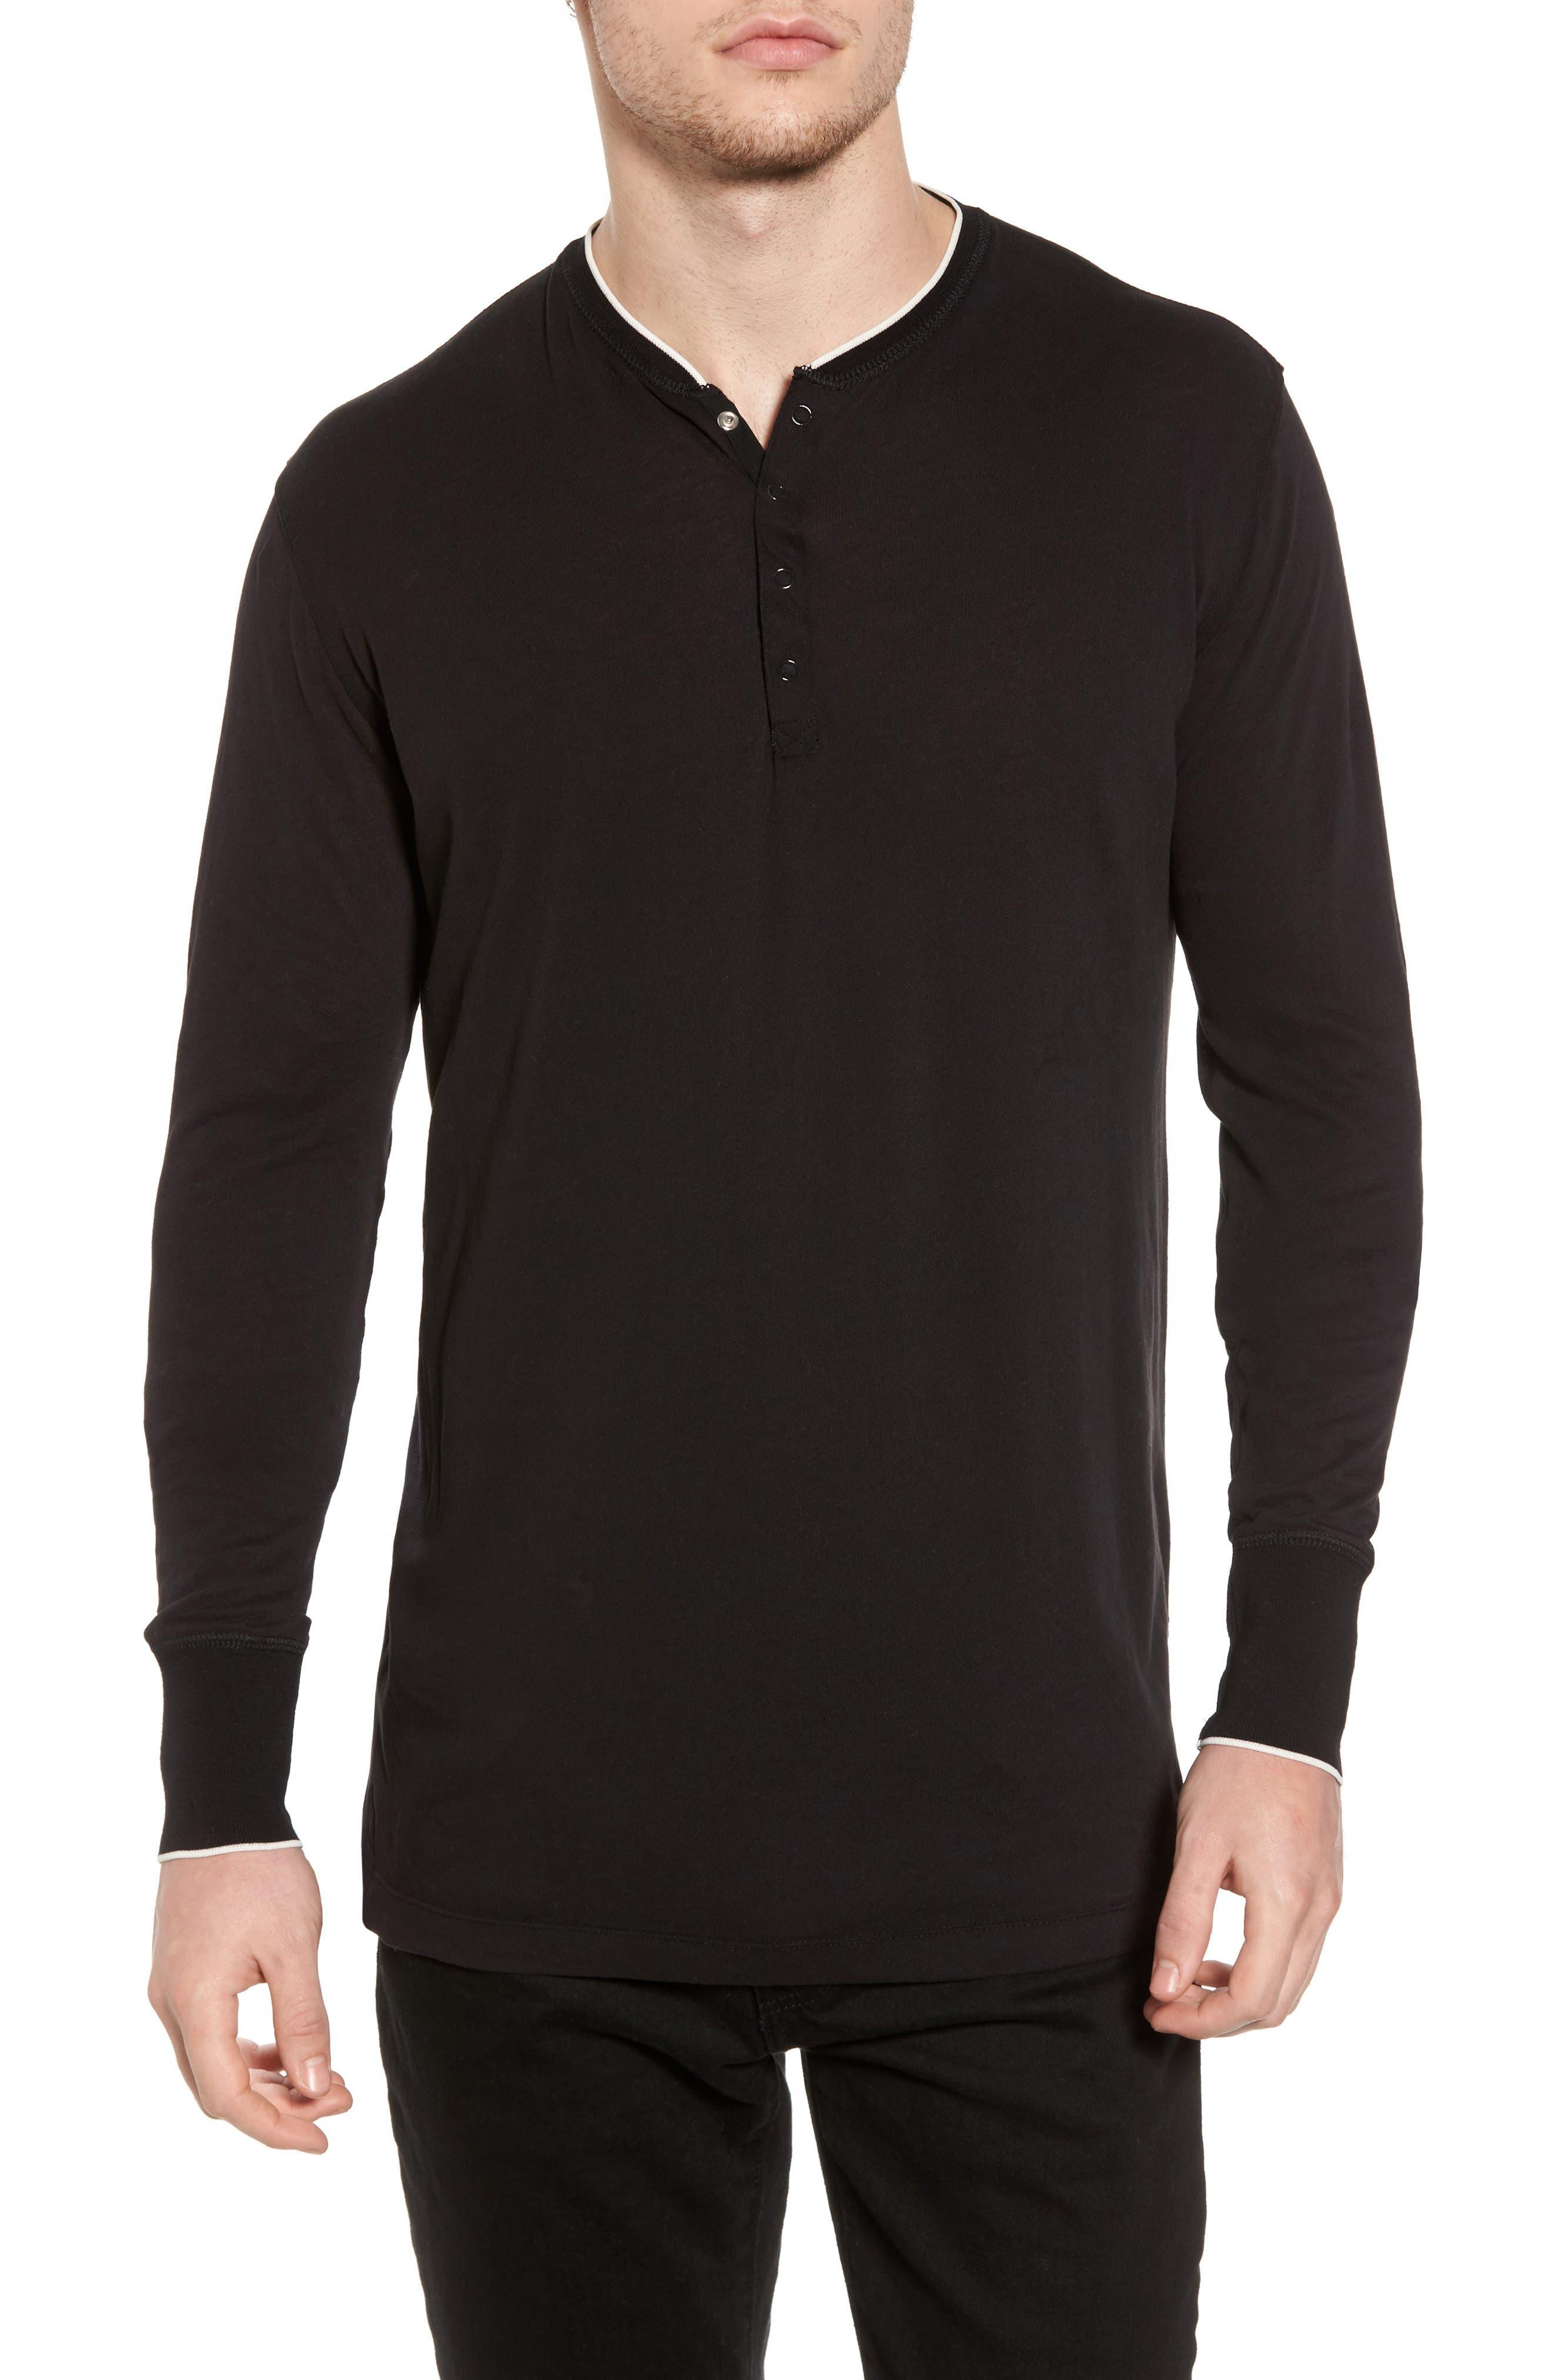 Club Nomade Soft Granddad T-Shirt,                         Main,                         color,